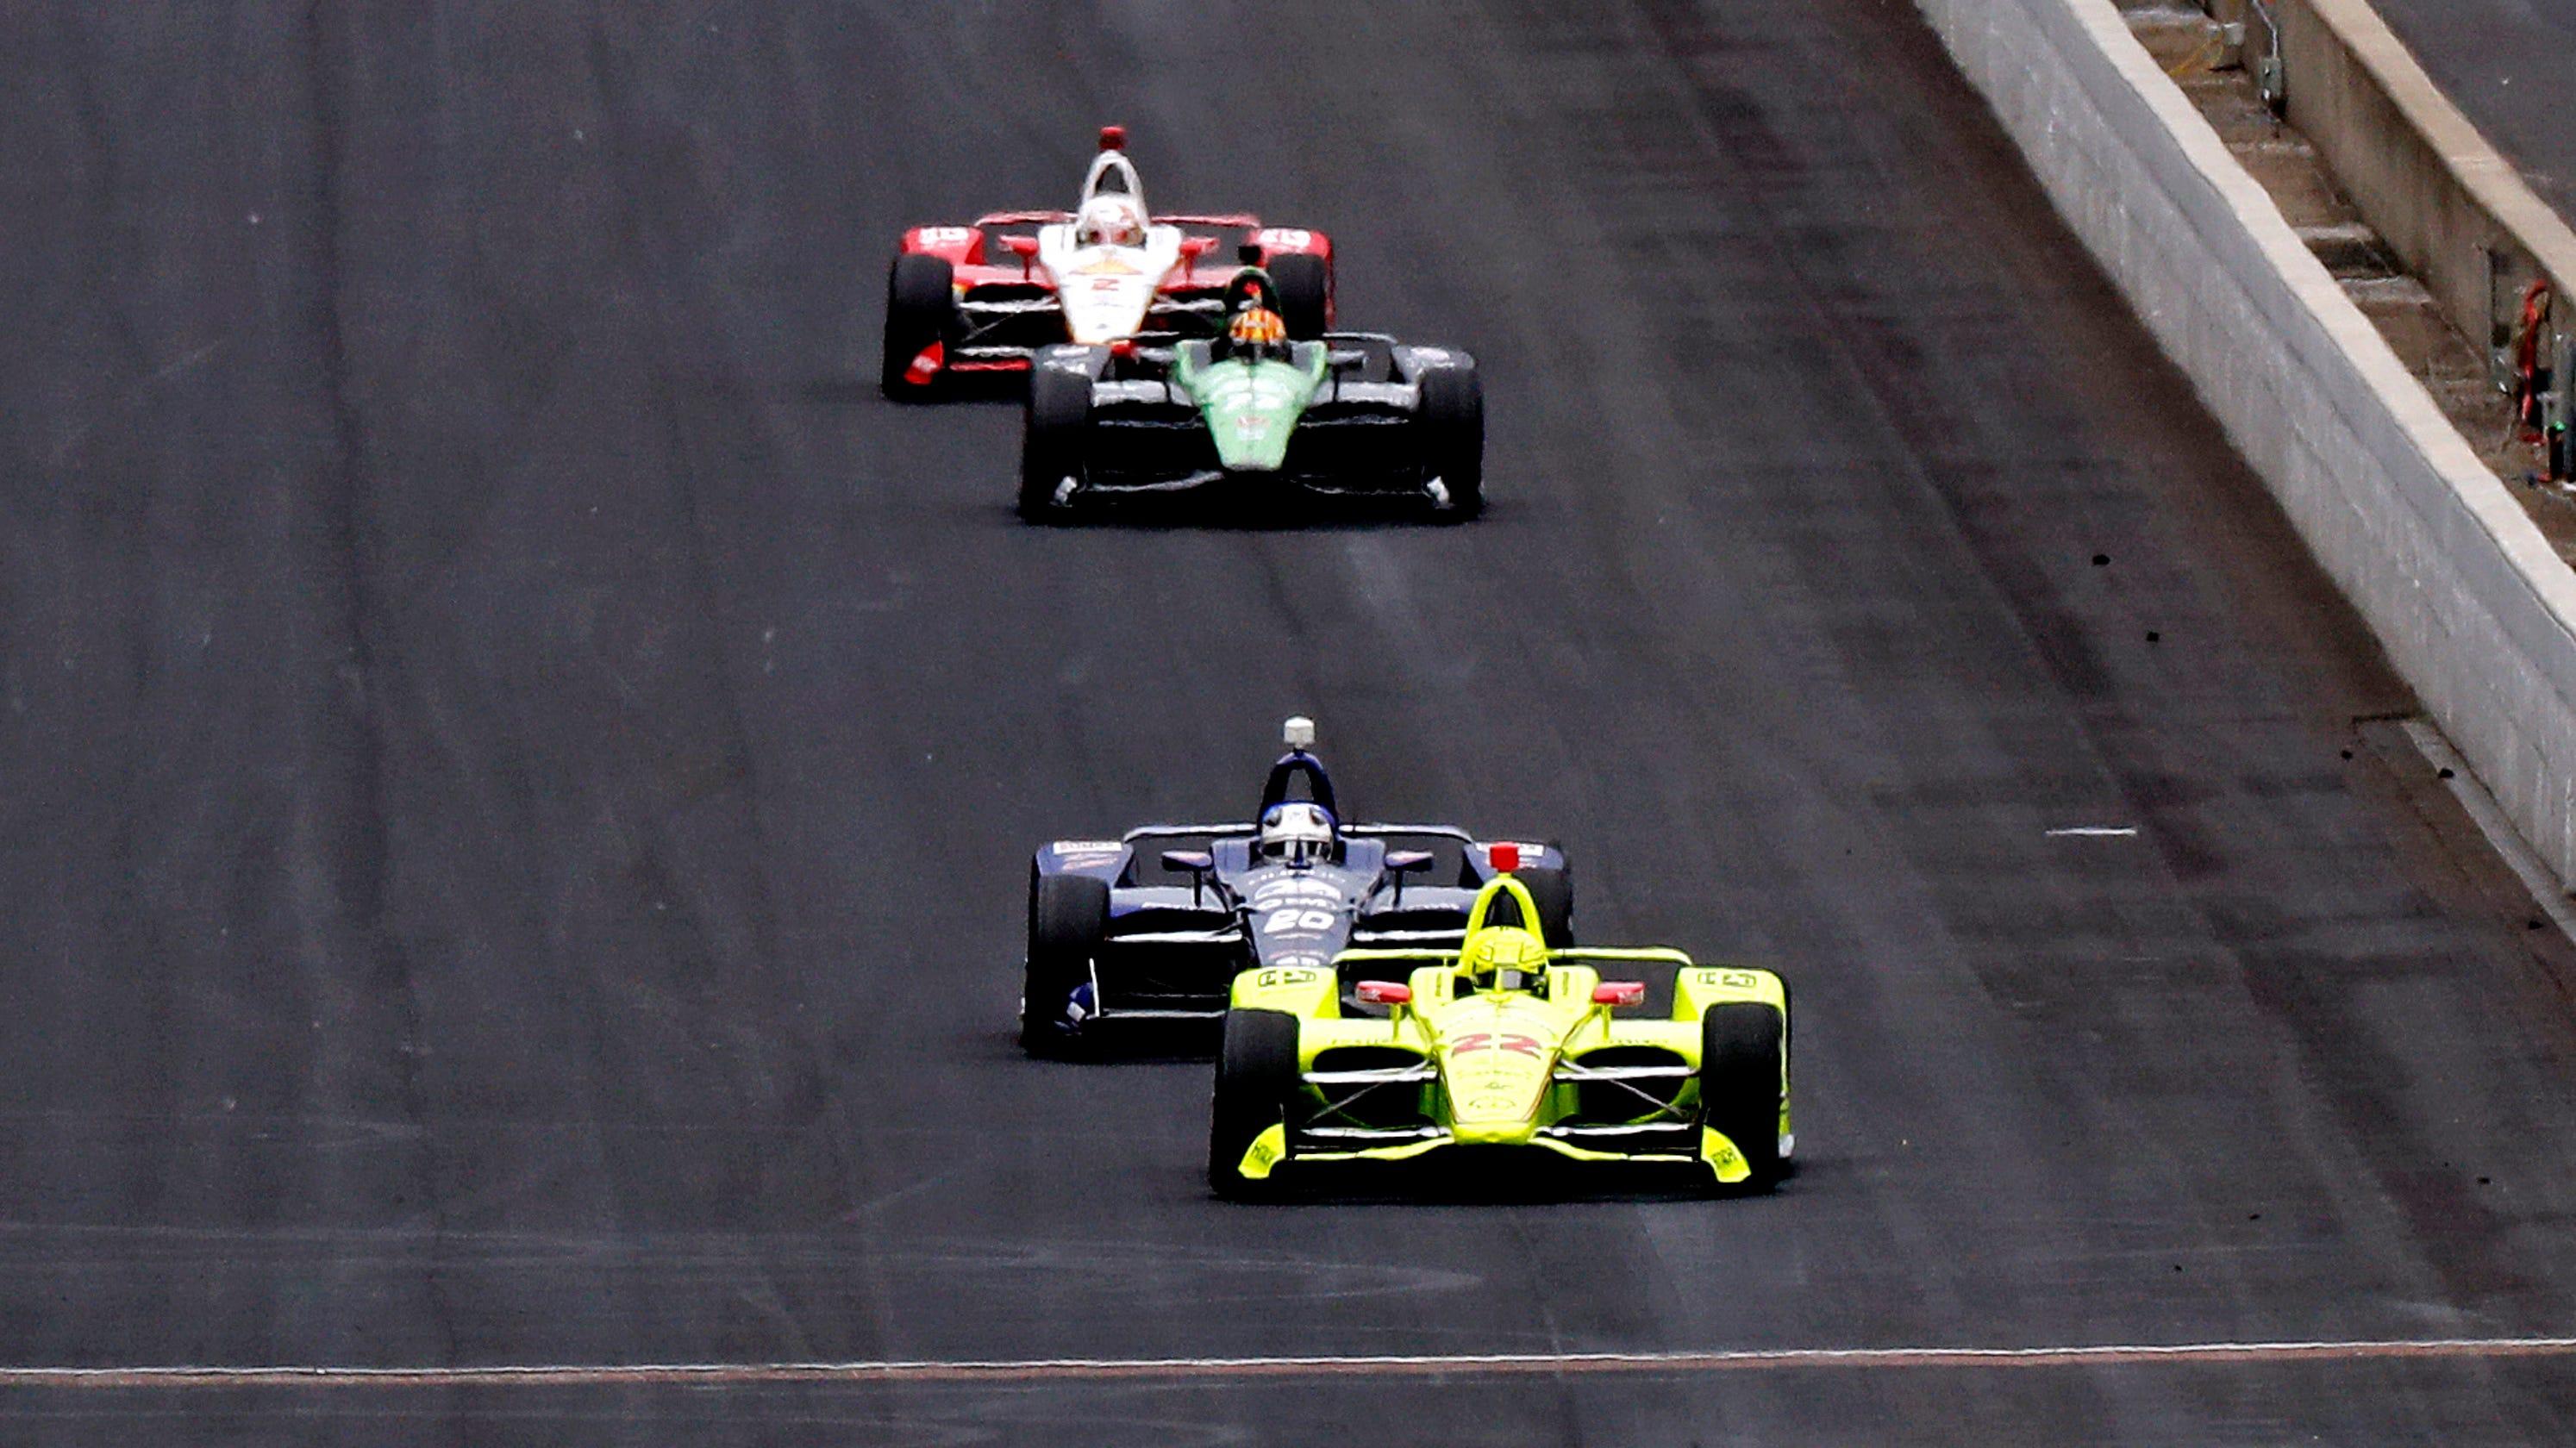 2019 Indy 500: Simon Pagenaud Wins 103rd Running